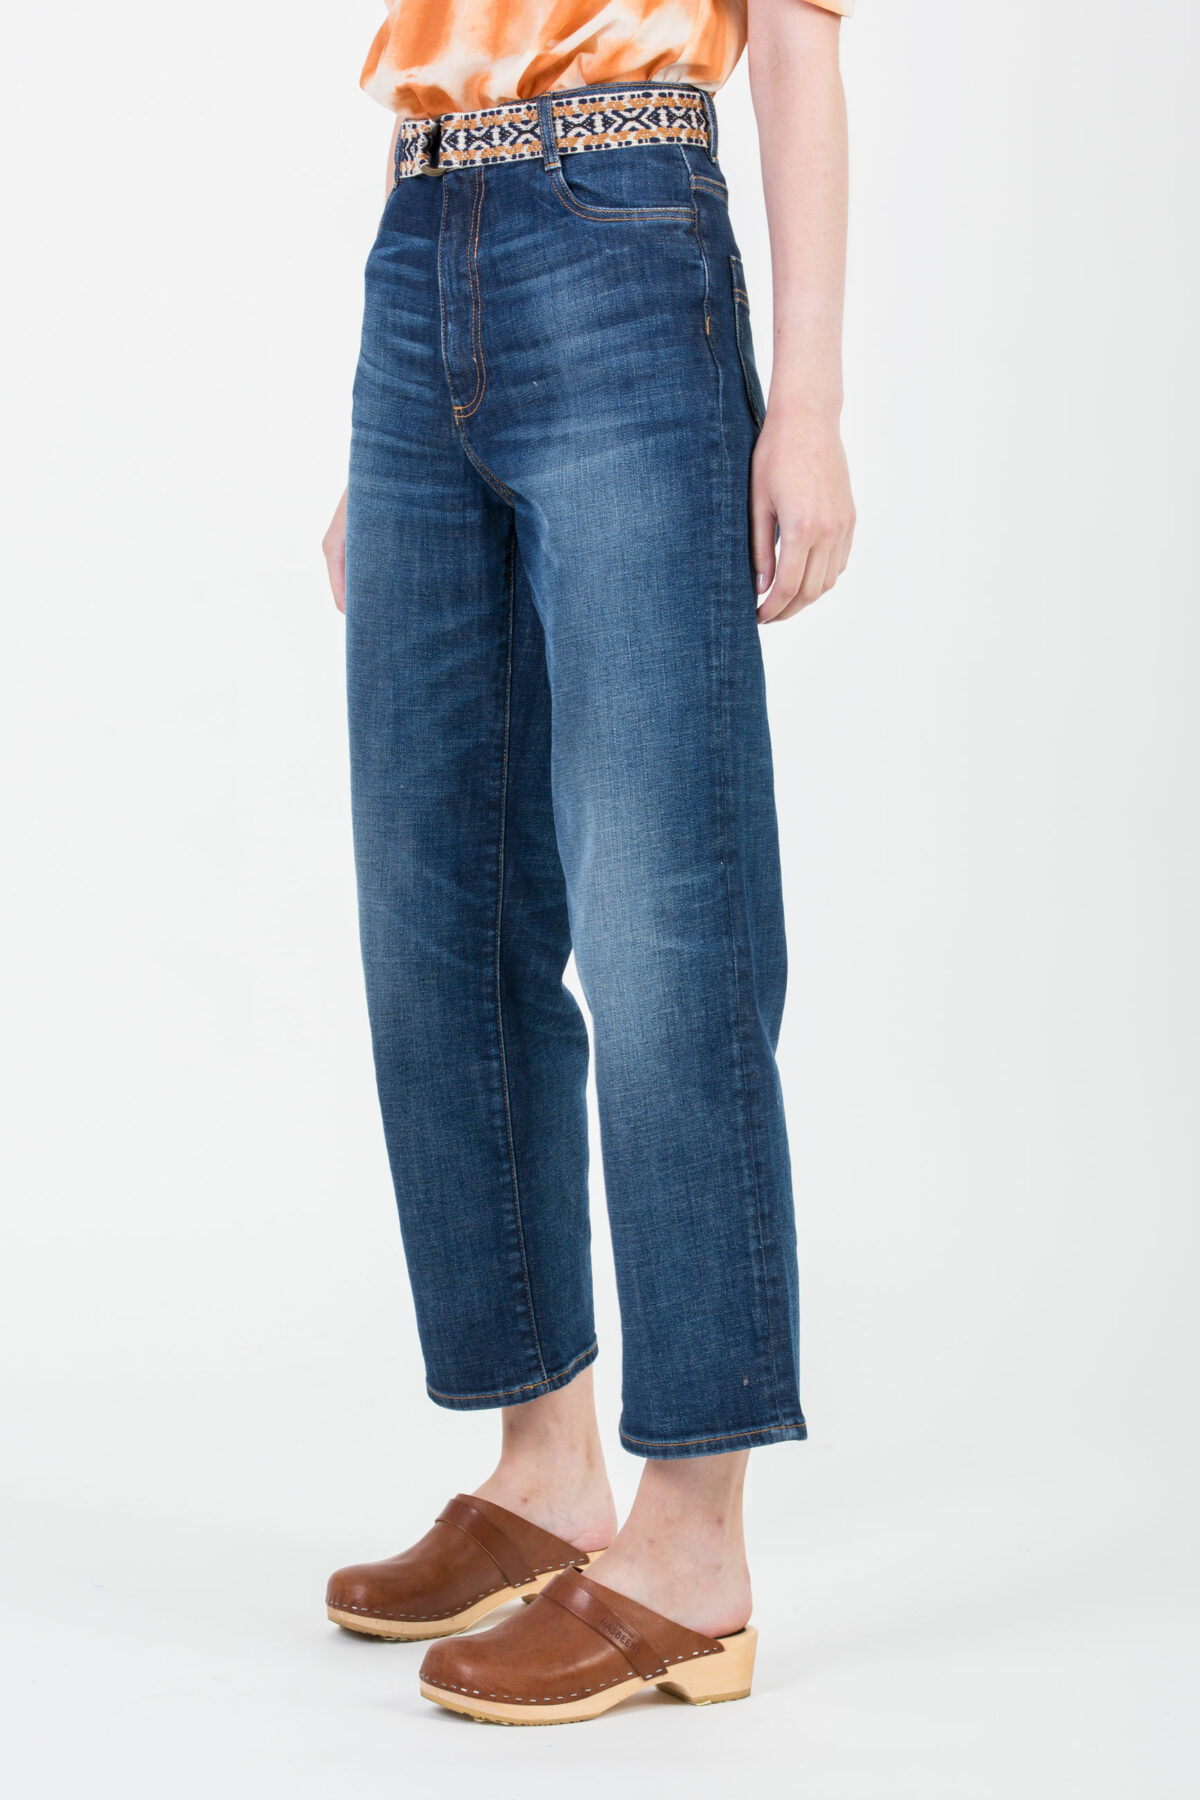 bay-cruise-blue-jeans-sessun-high-rise-matchboxathens